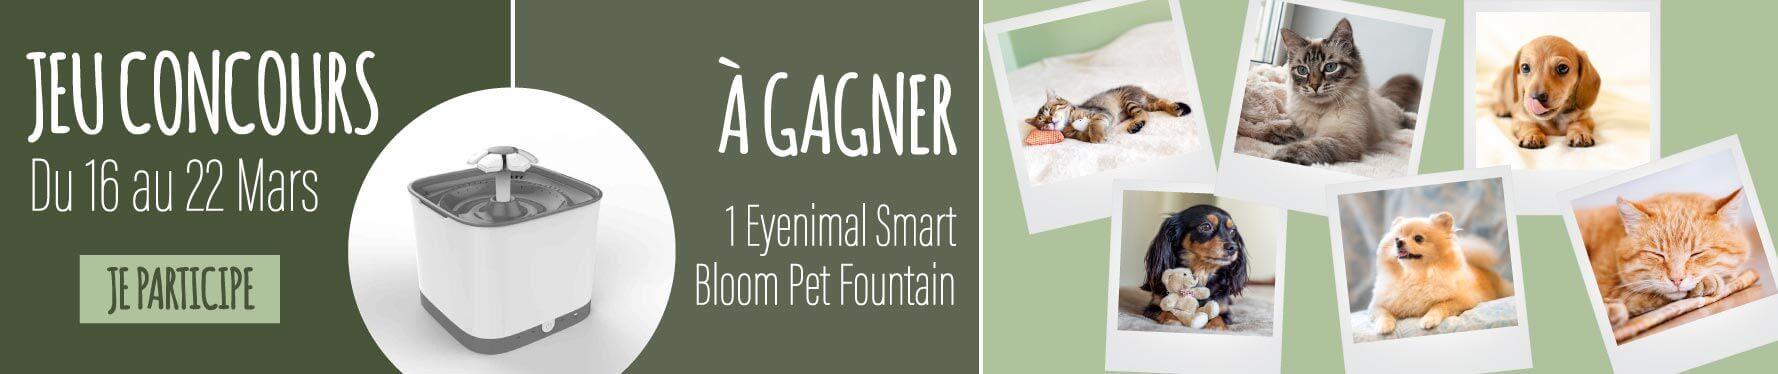 Jeu concours Eyenimal Smart Bloom Pet Fountain